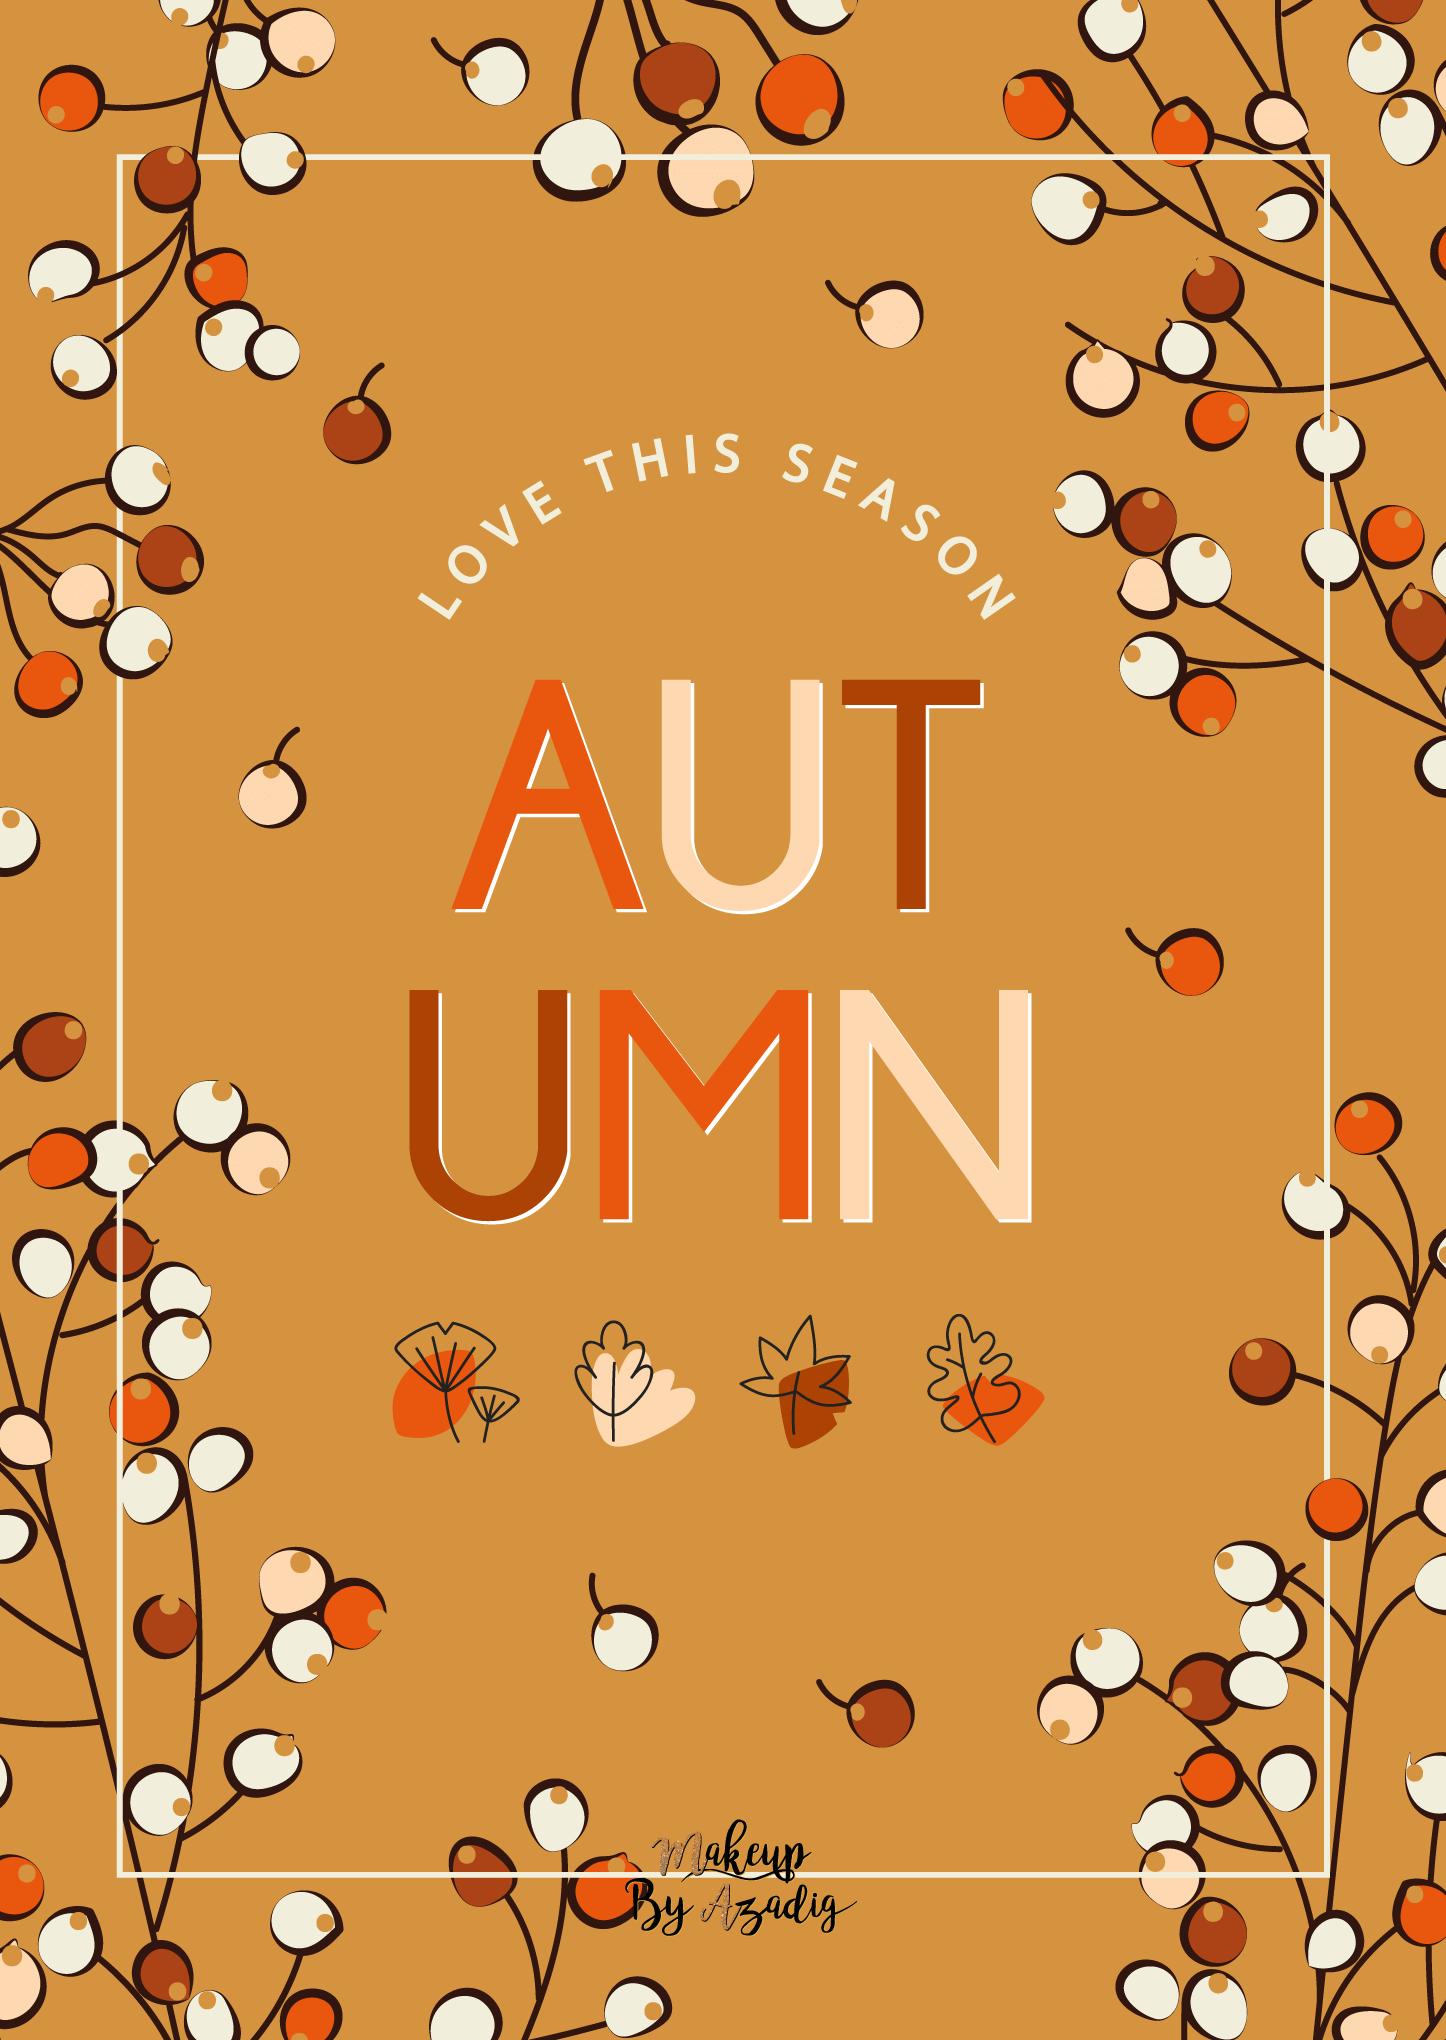 fond-decran-wallpaper-automne-leaves-autumn-season-ipad-tablette-apple-makeupbyazadig-tendance